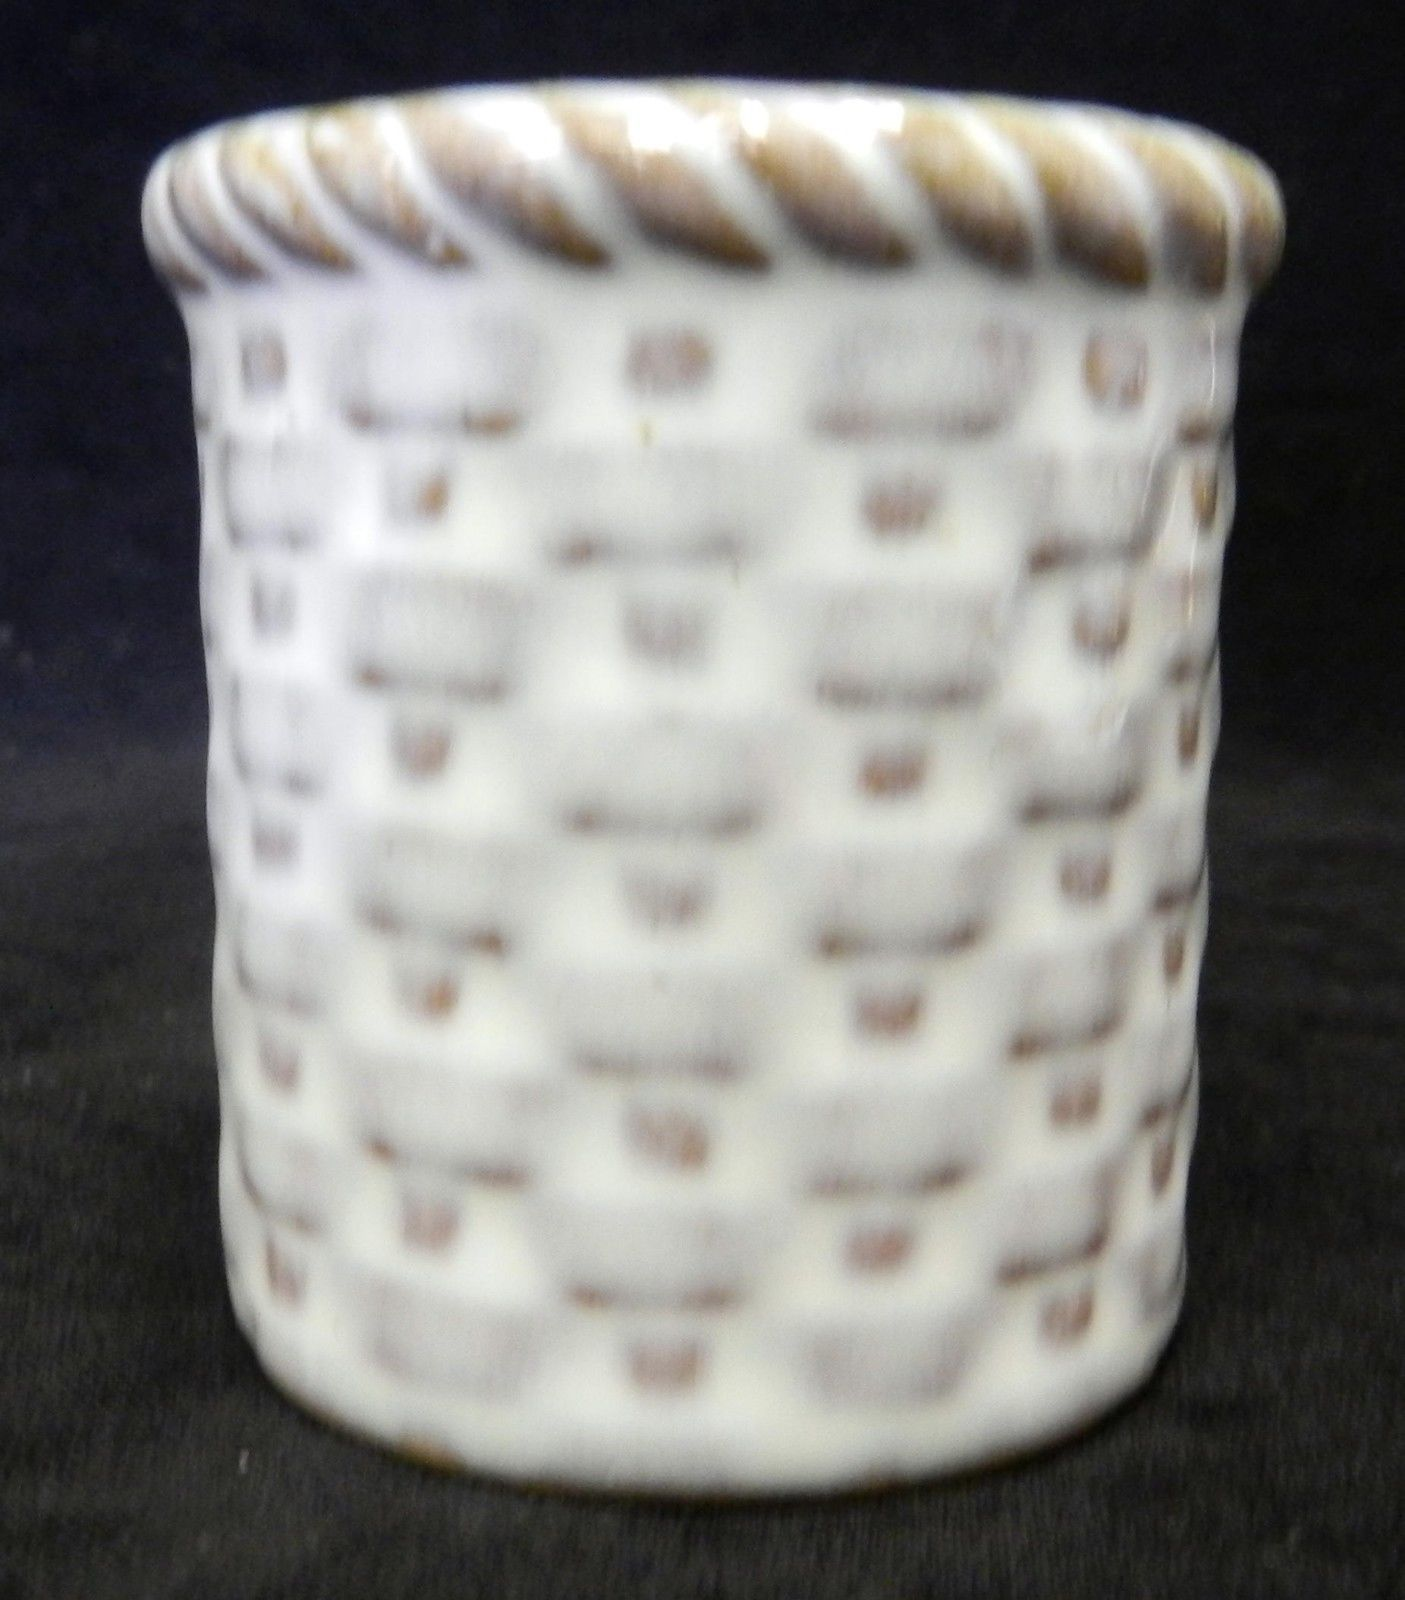 Vintage karol western las vegas nv cactus dice basket souvenir toothpick holder nevada - Cactus toothpick holder ...